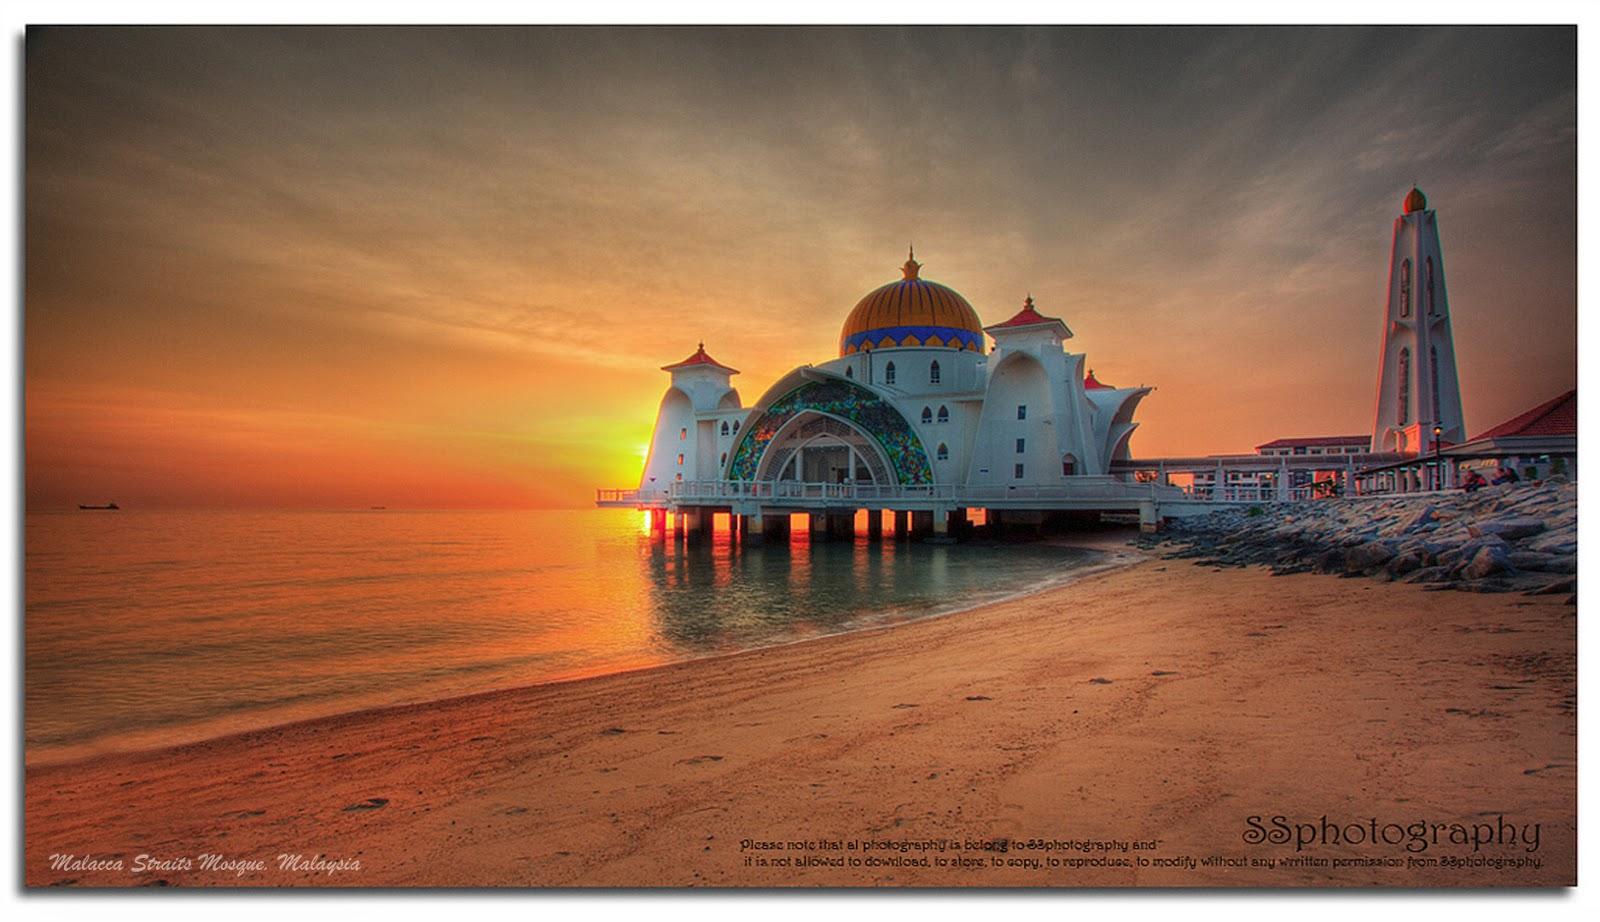 Mosques Hd Wallpapers Wallpaper202